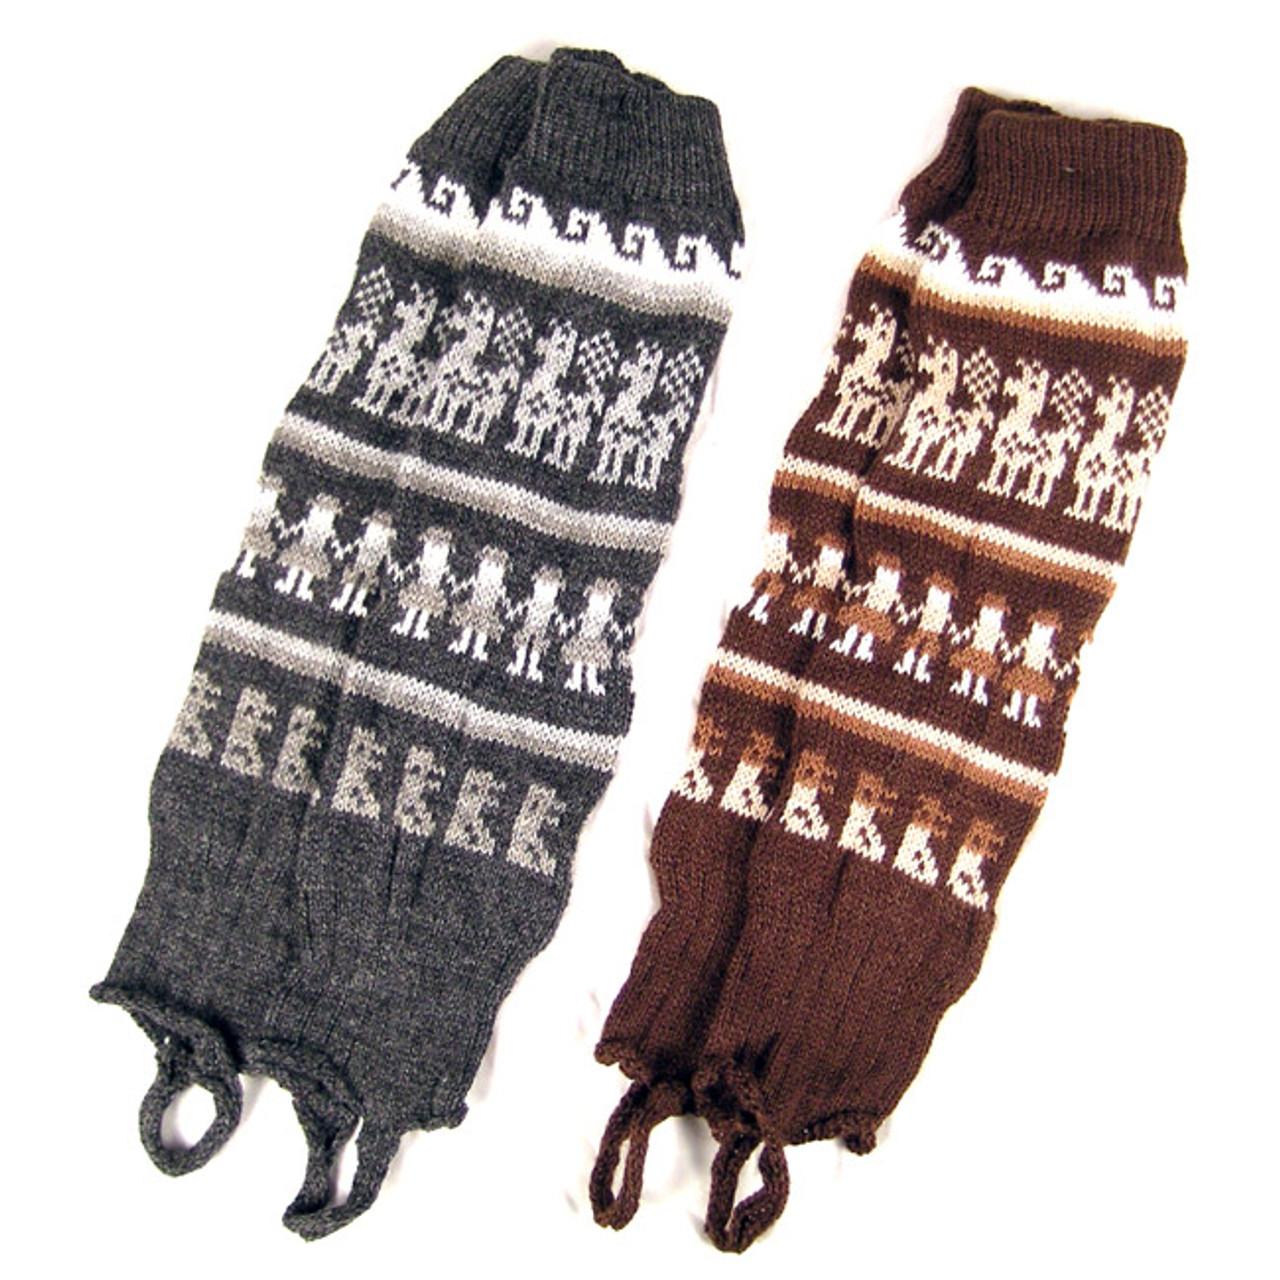 Fair Trade Unisex Bolivian Soft Alpaca Woollen Wool Legwarmers for Man or Woman